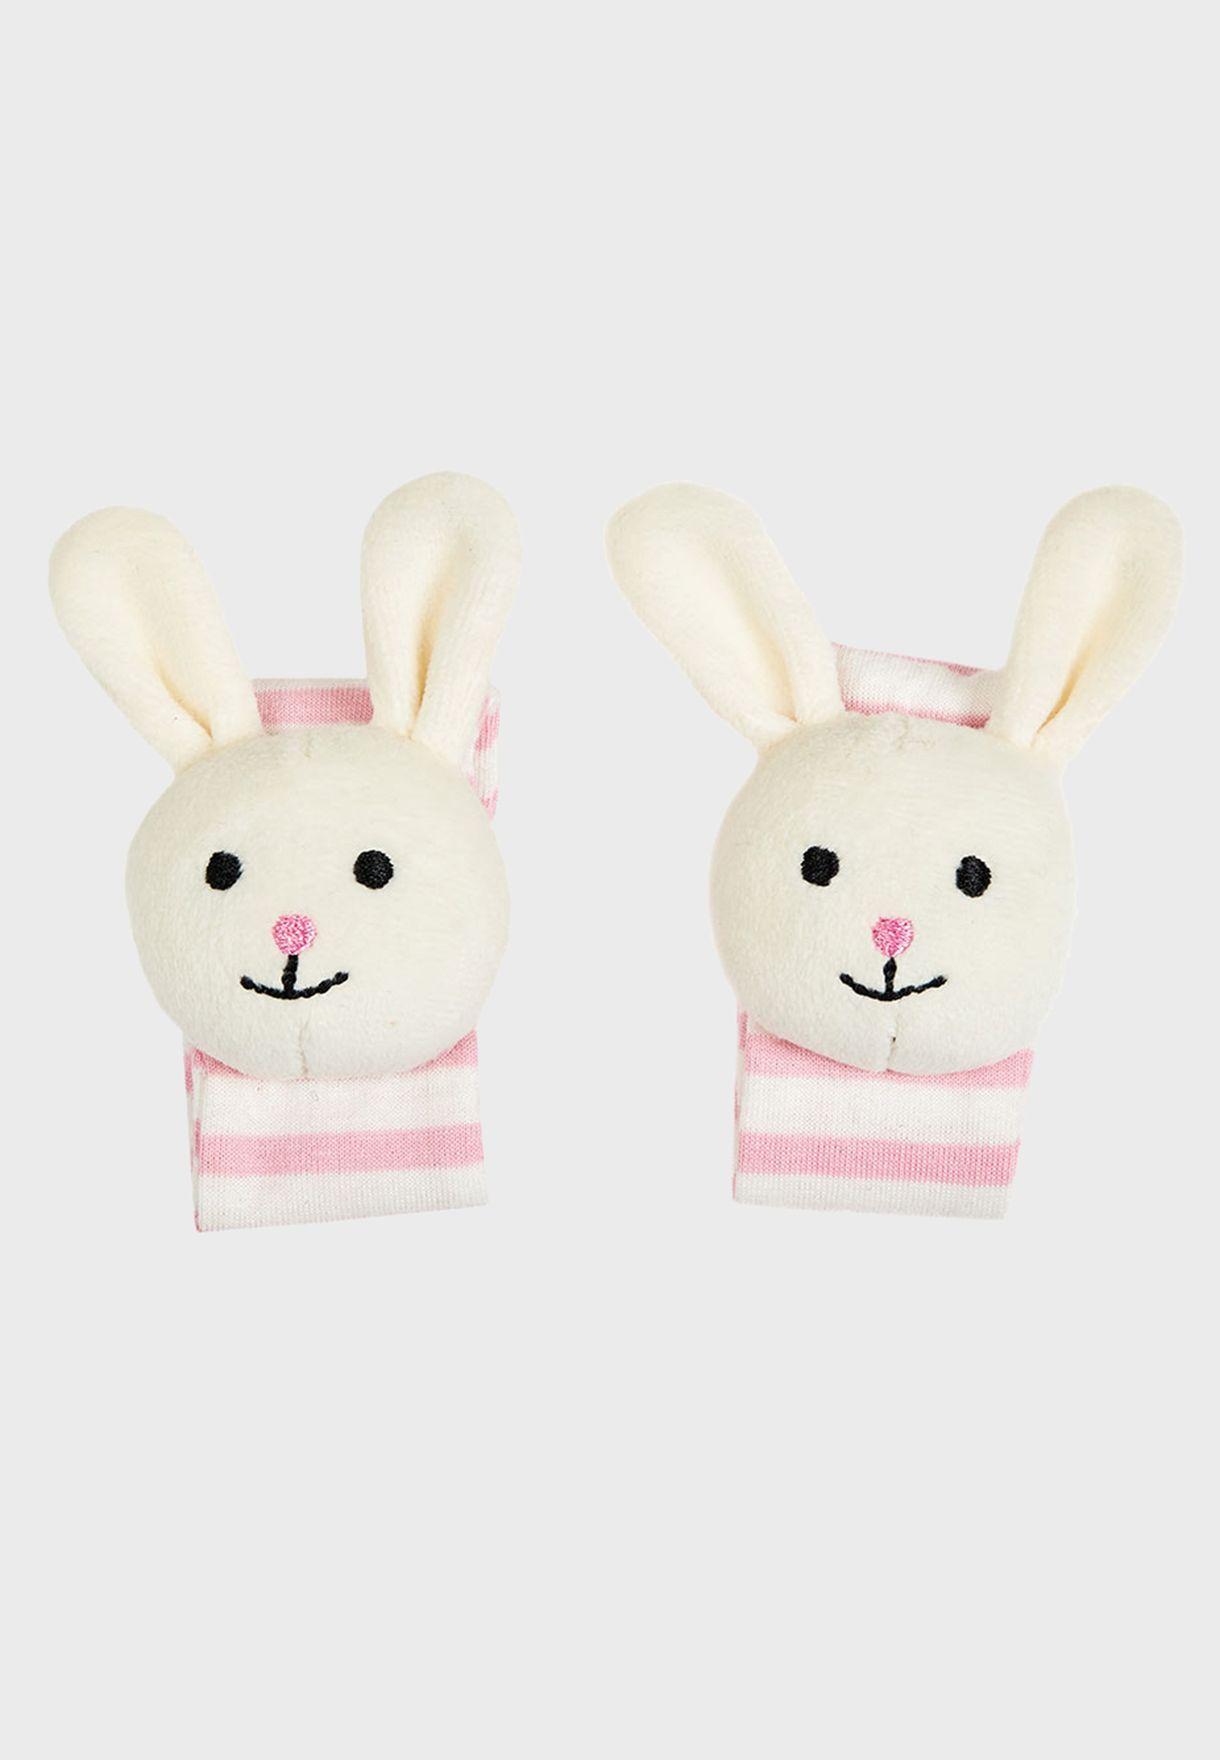 Bunny Wrist Rattles